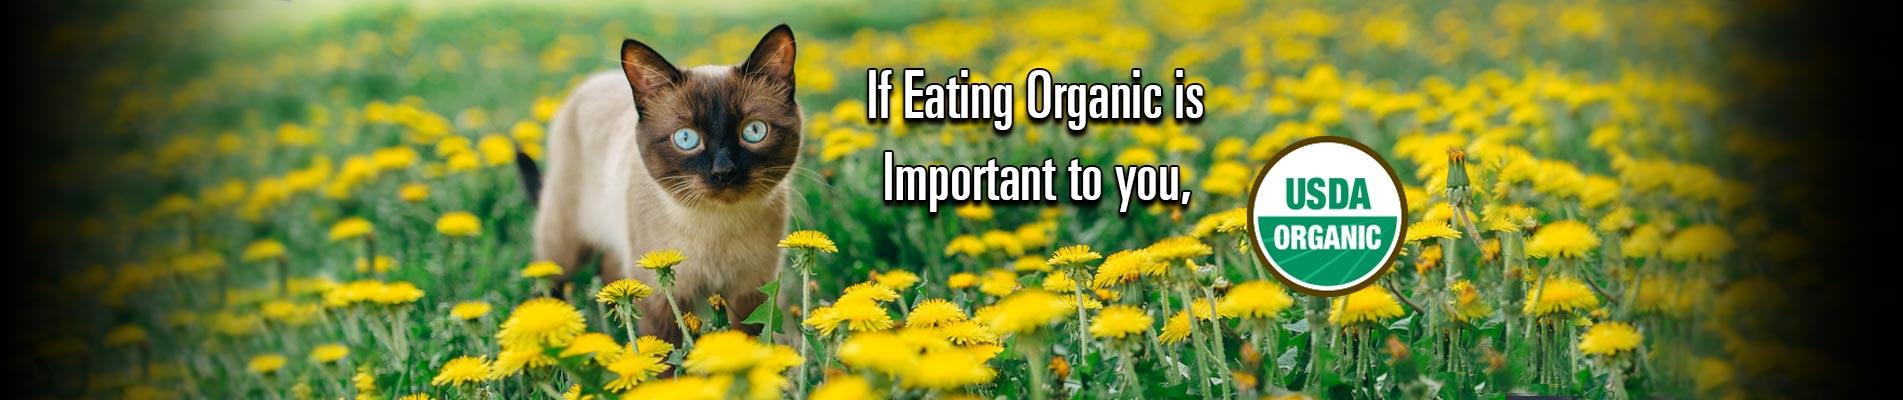 home_slideshow_slide-Eating-Organic233